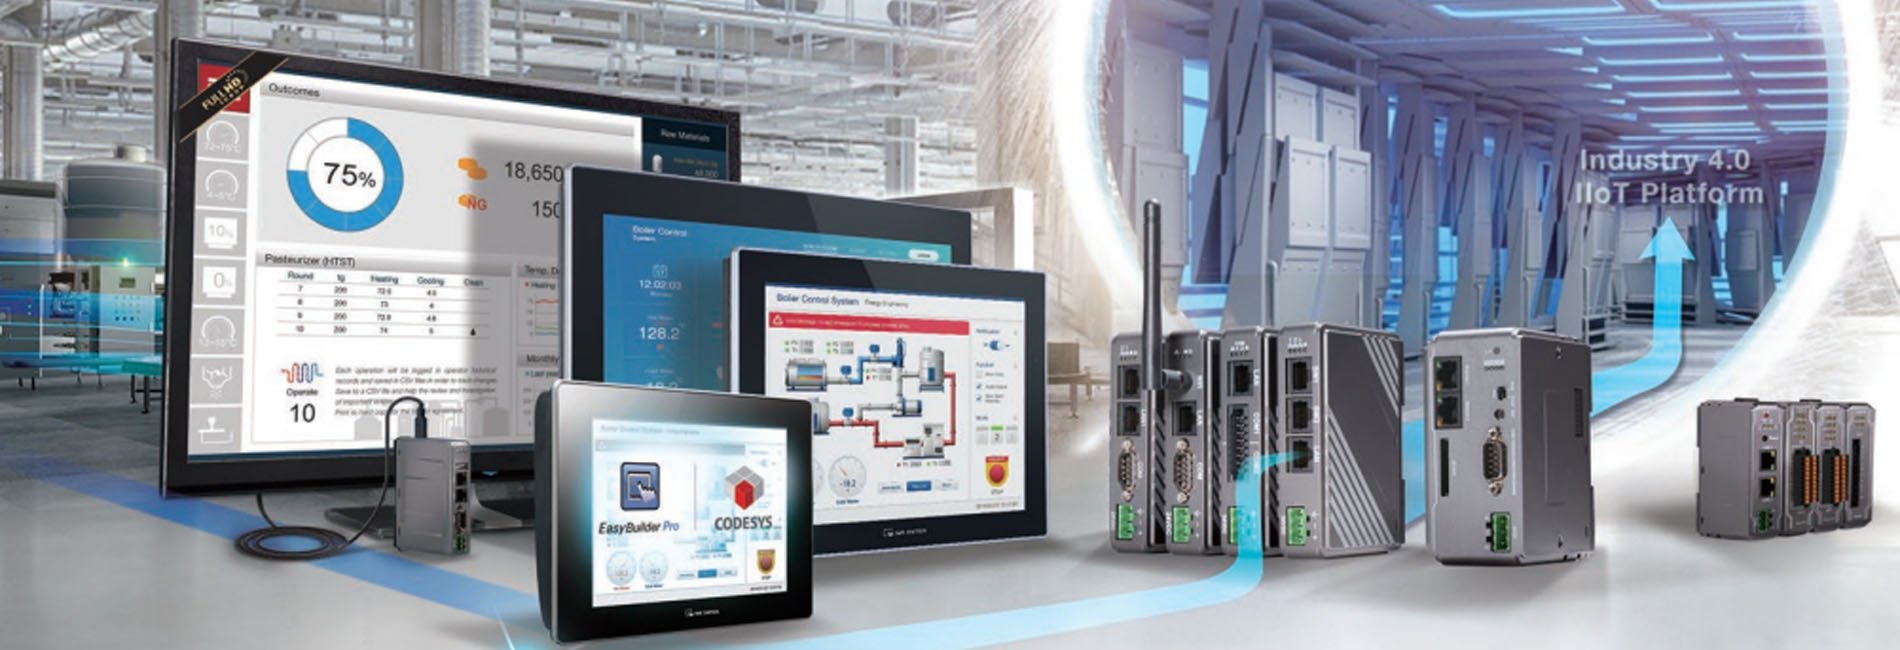 Spec-Tech Industrial